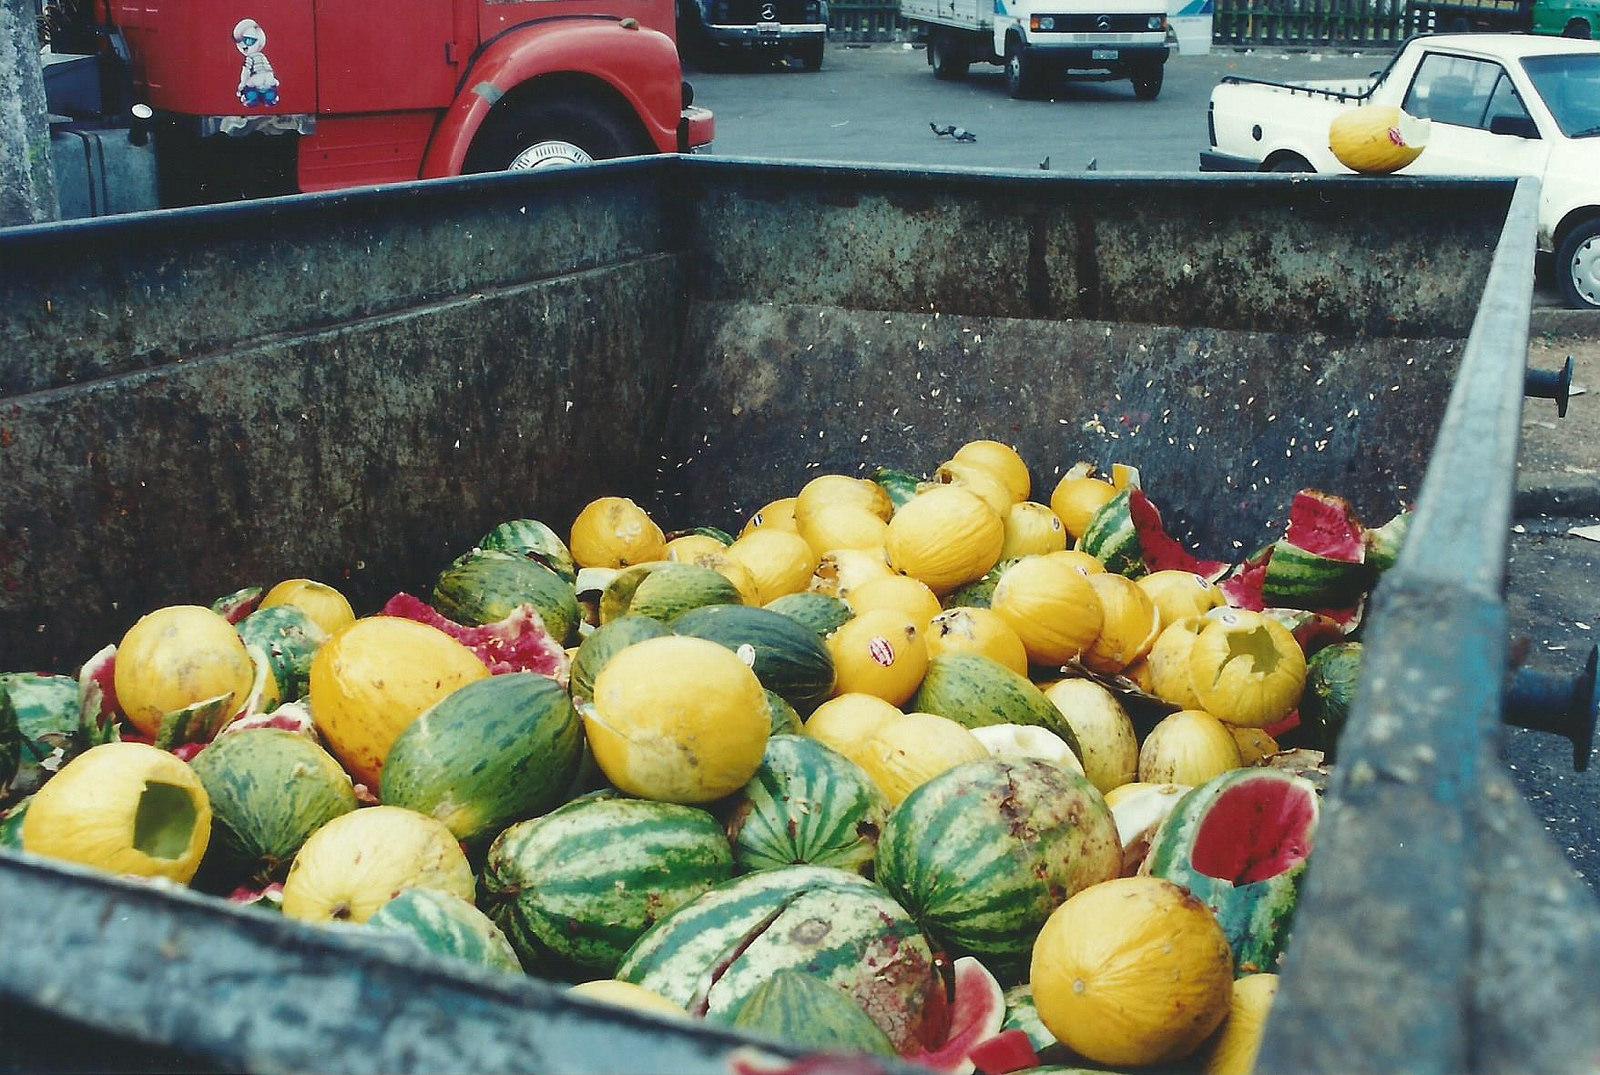 Frutas jogadas no lixo no Brasil. Foto: Flickr/Núcleo Editorial/Katia Mello (CC).